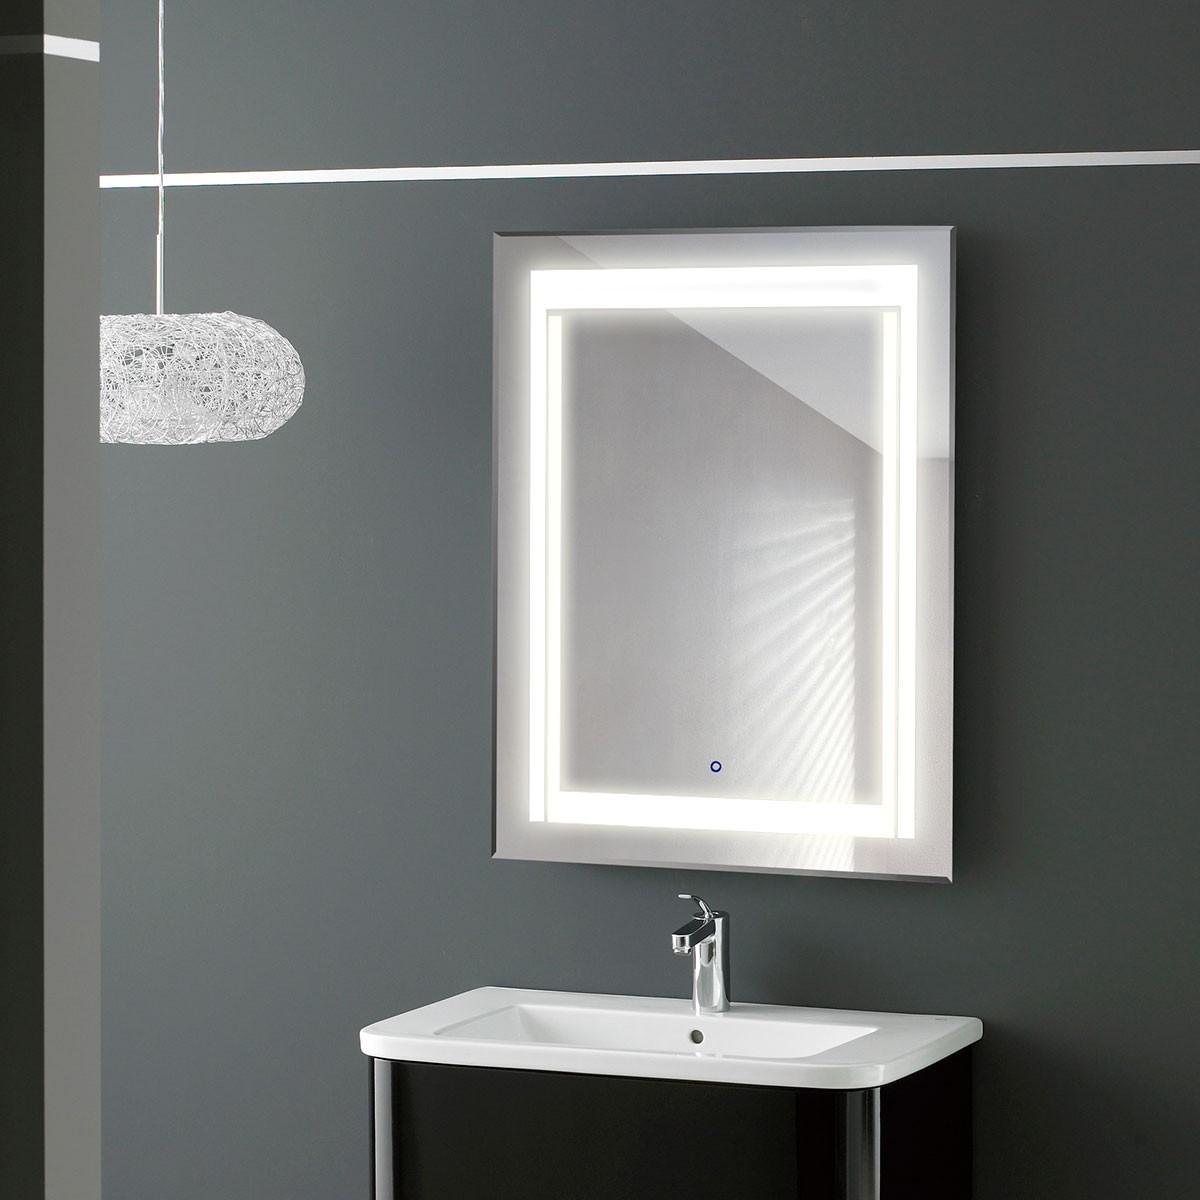 spot salle de bain avec interrupteur. Black Bedroom Furniture Sets. Home Design Ideas